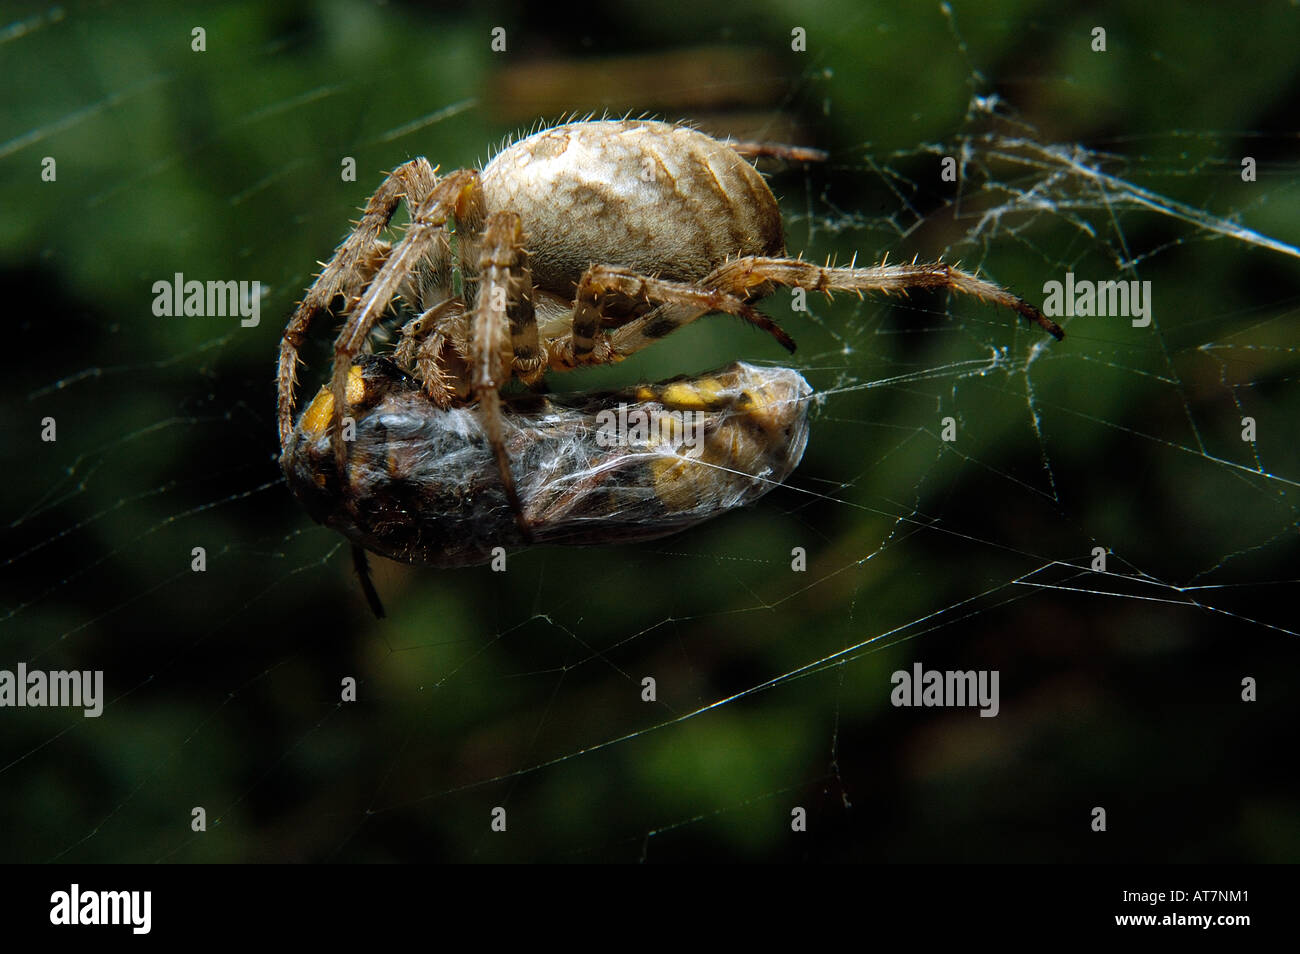 The European garden spider, diadem spider, cross spider, or cross orbweaver (Araneus diadematus)  with captured Hornet - Stock Image